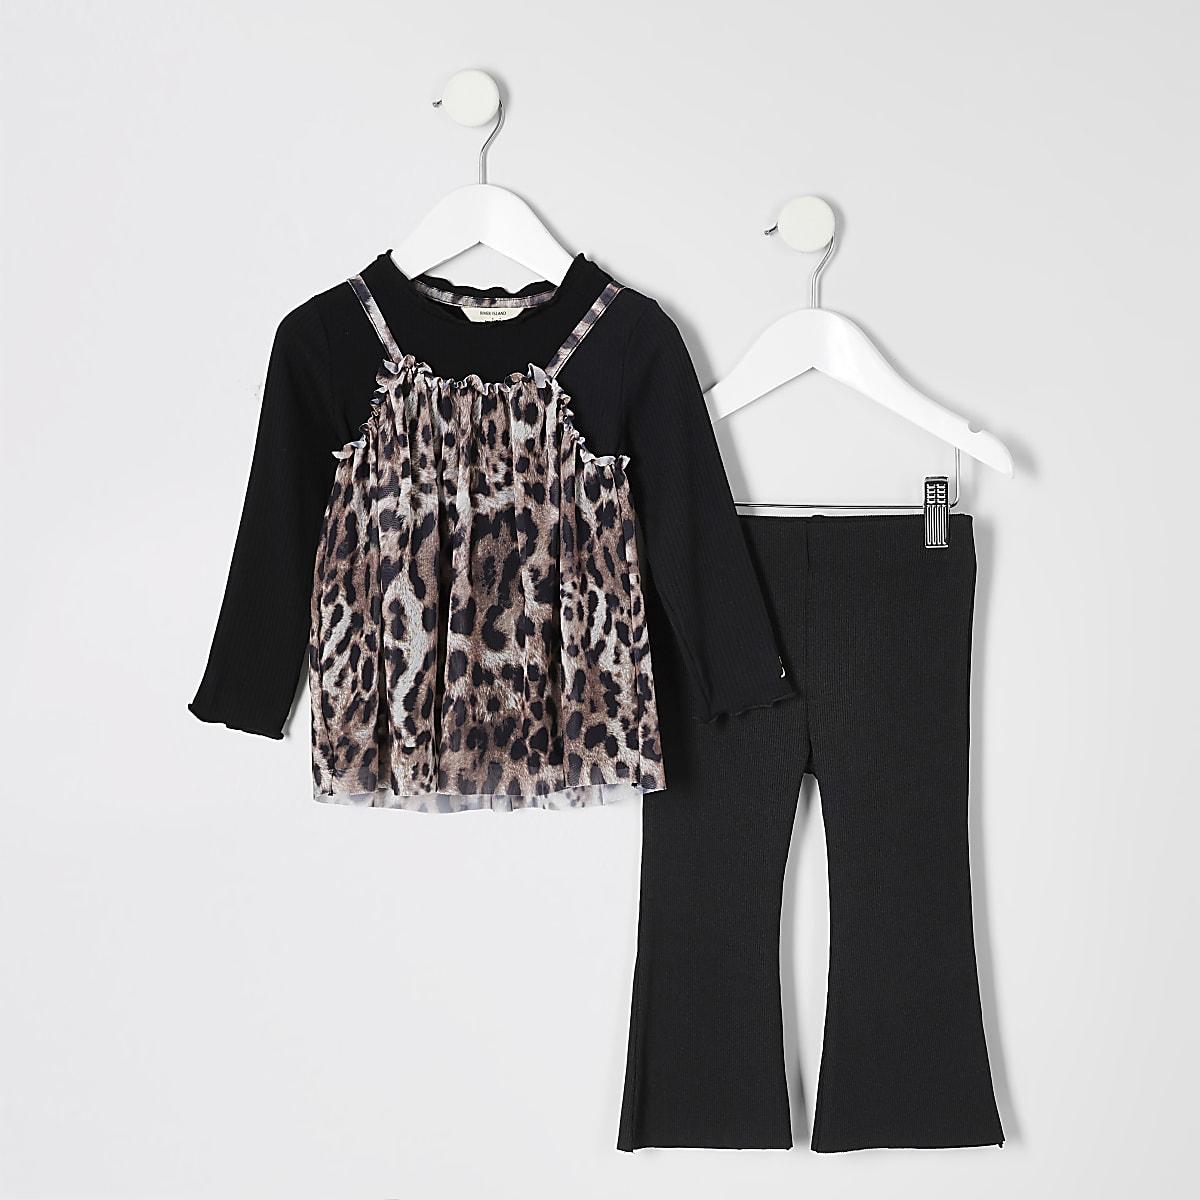 Mini girls black leopard mesh top outfit